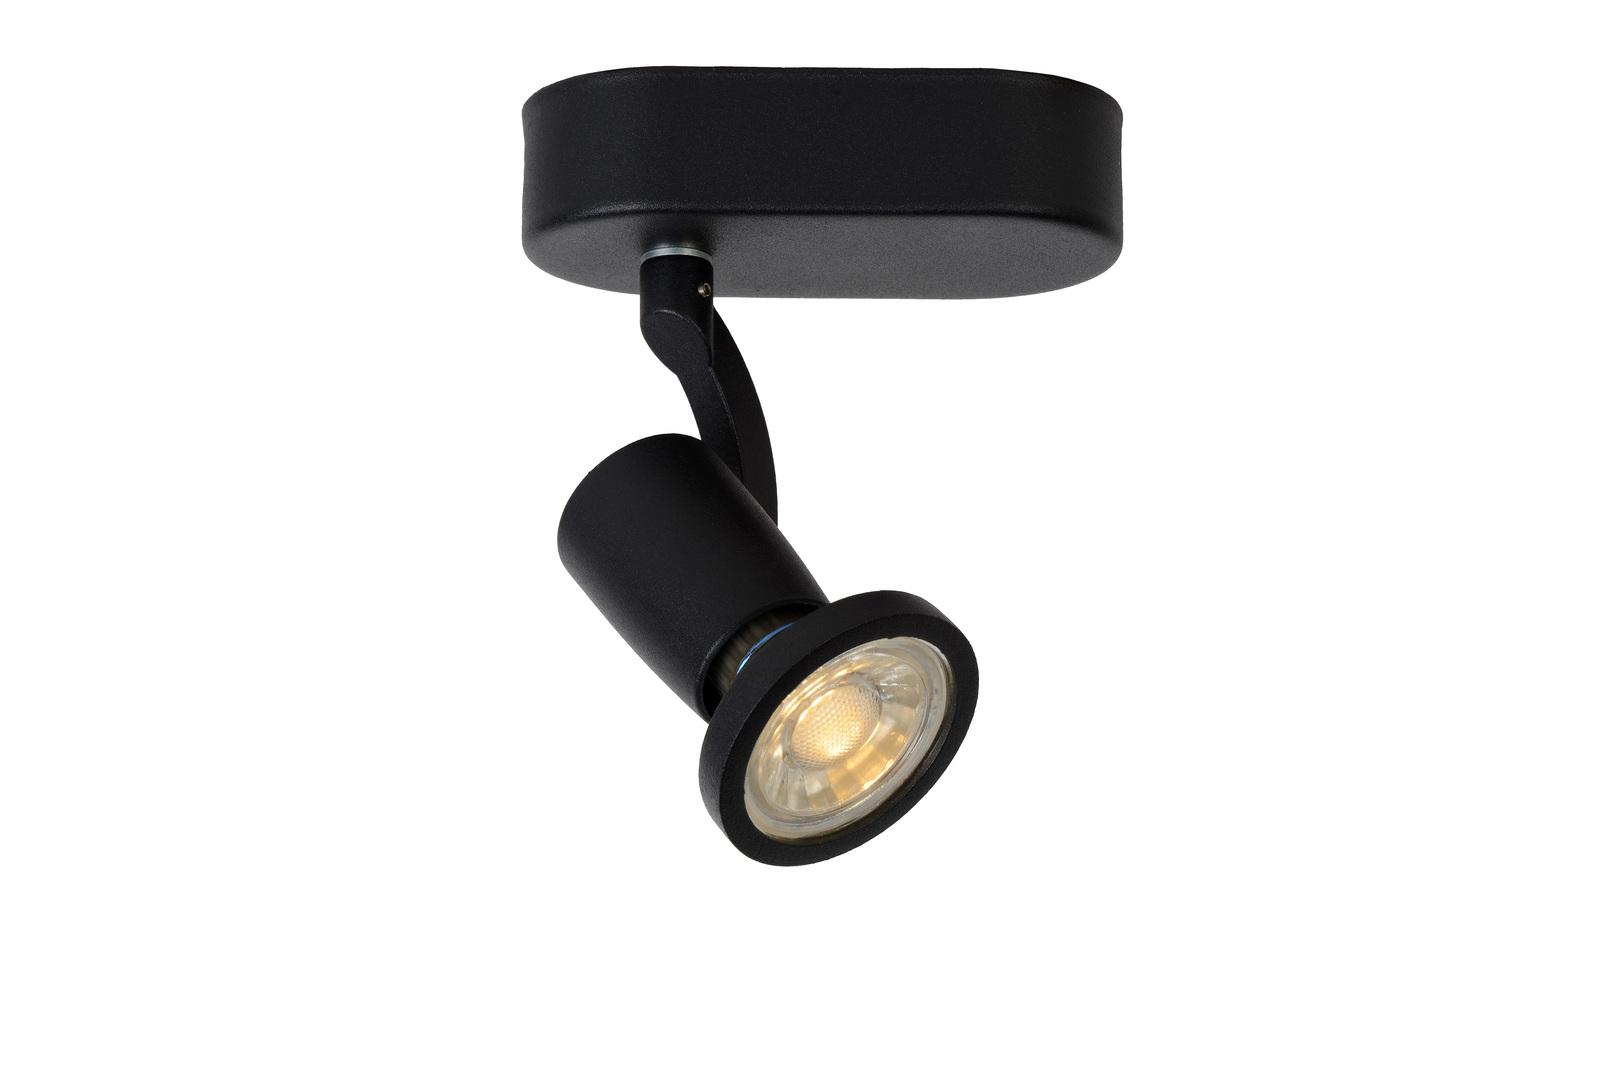 Lampă de perete STER negru GU10